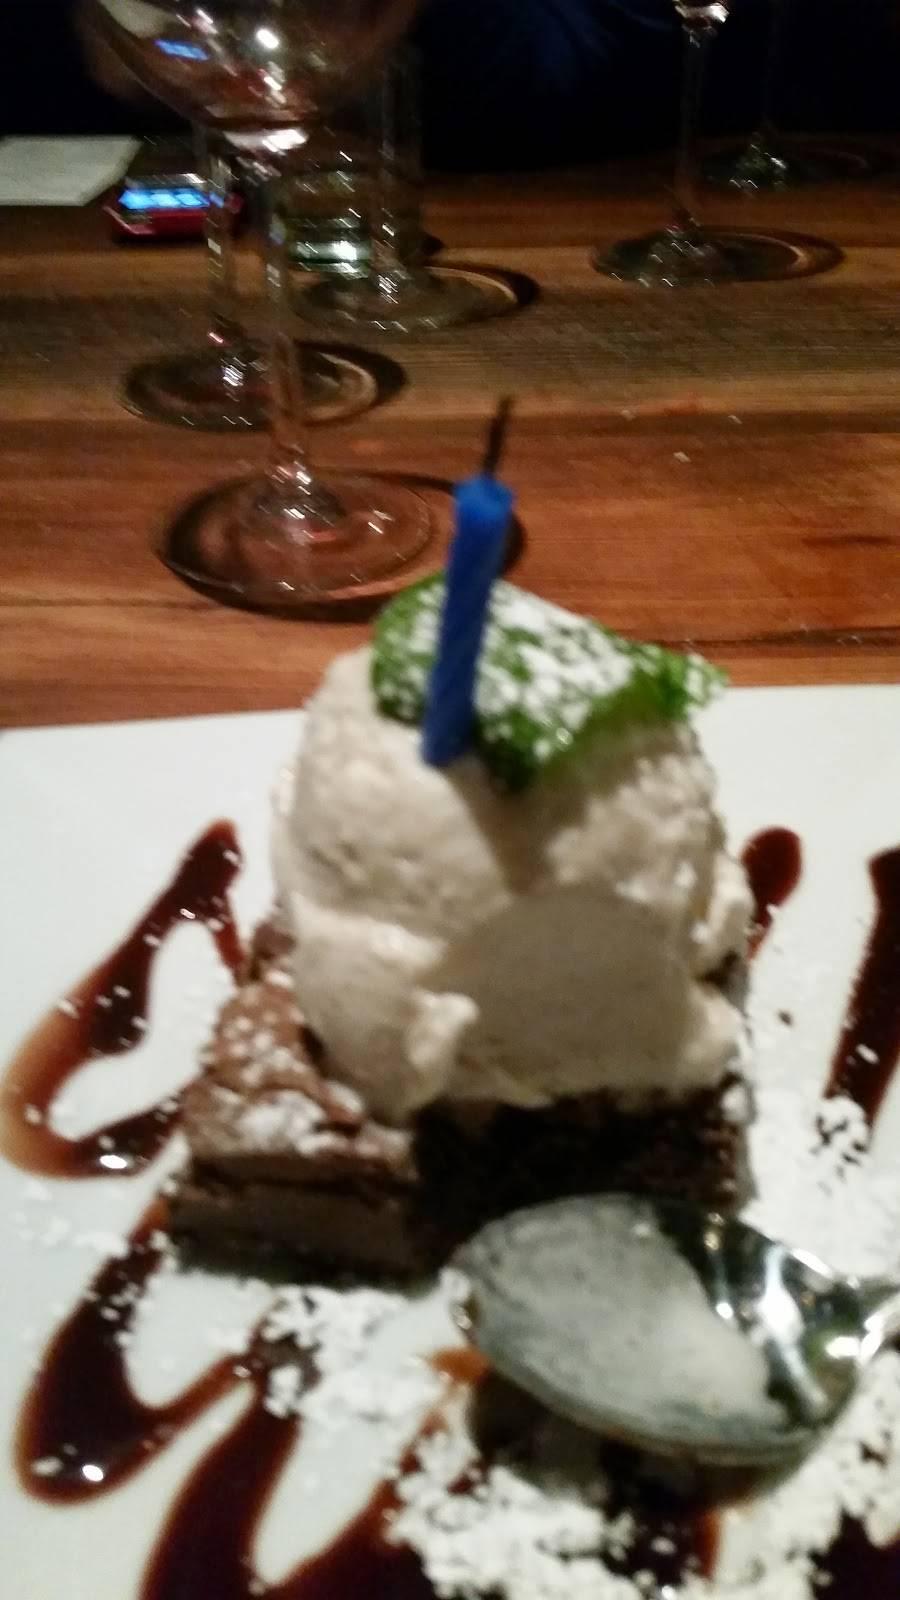 Dining Room At Anthony Davids | restaurant | 111 10th St, Hoboken, NJ 07030, USA | 2012228359 OR +1 201-222-8359